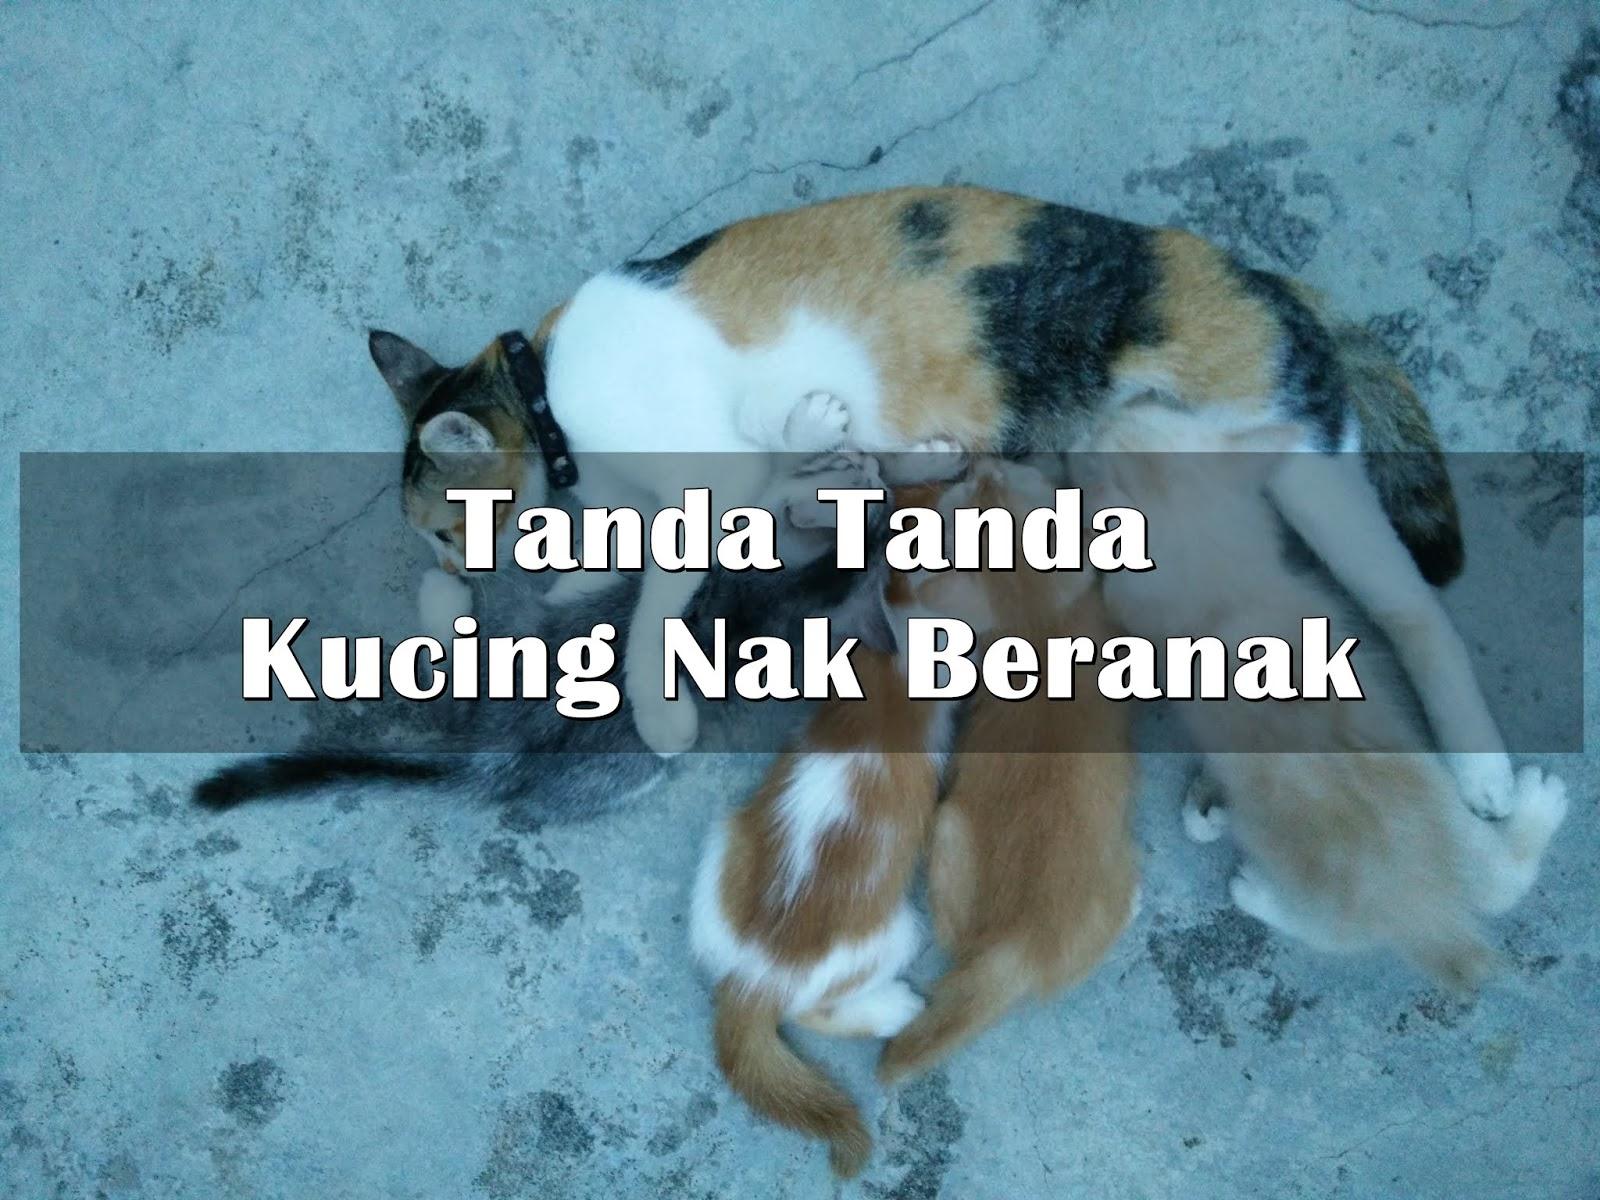 6 Tanda Tanda Kucing Nak Beranak Eintan Nurfuzie Lifestyle Beauty Travel Tips Rawatan Kucing Review